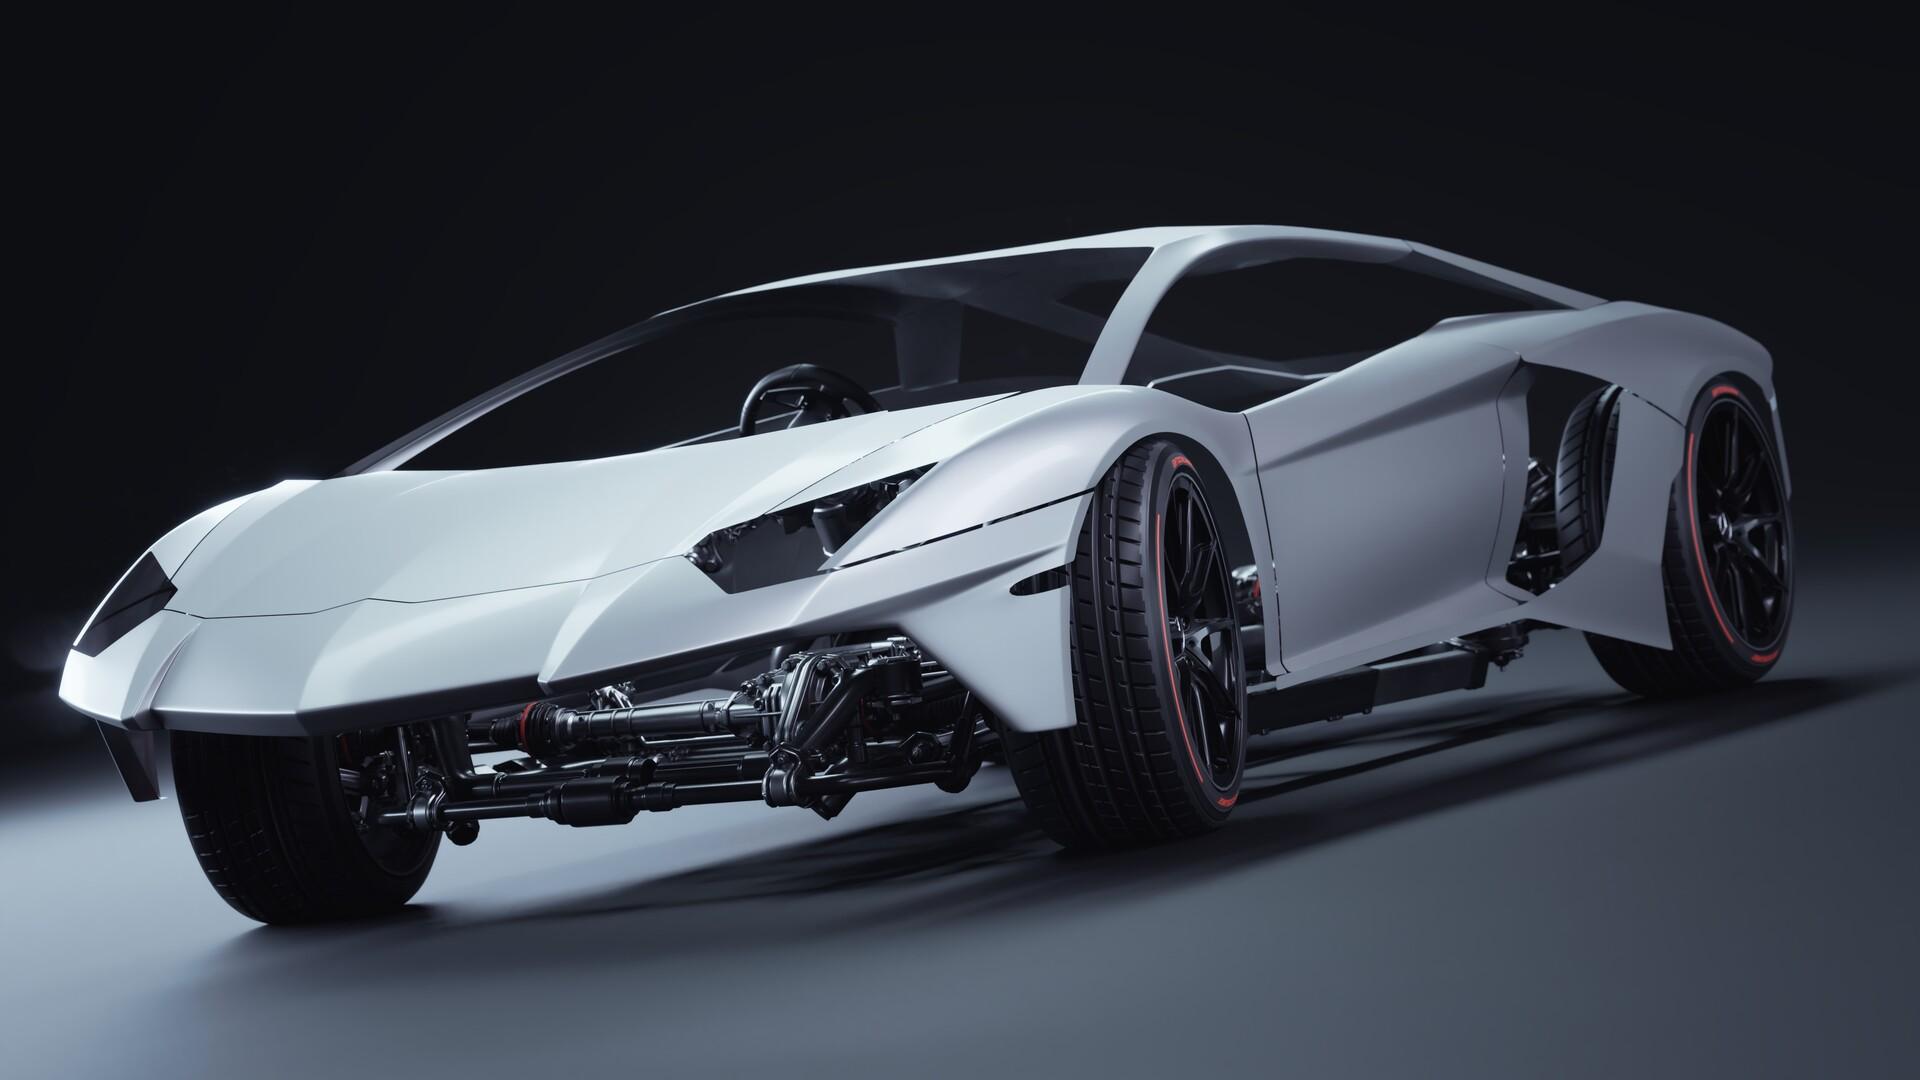 Lamborghini Aventador SV (Supercar)